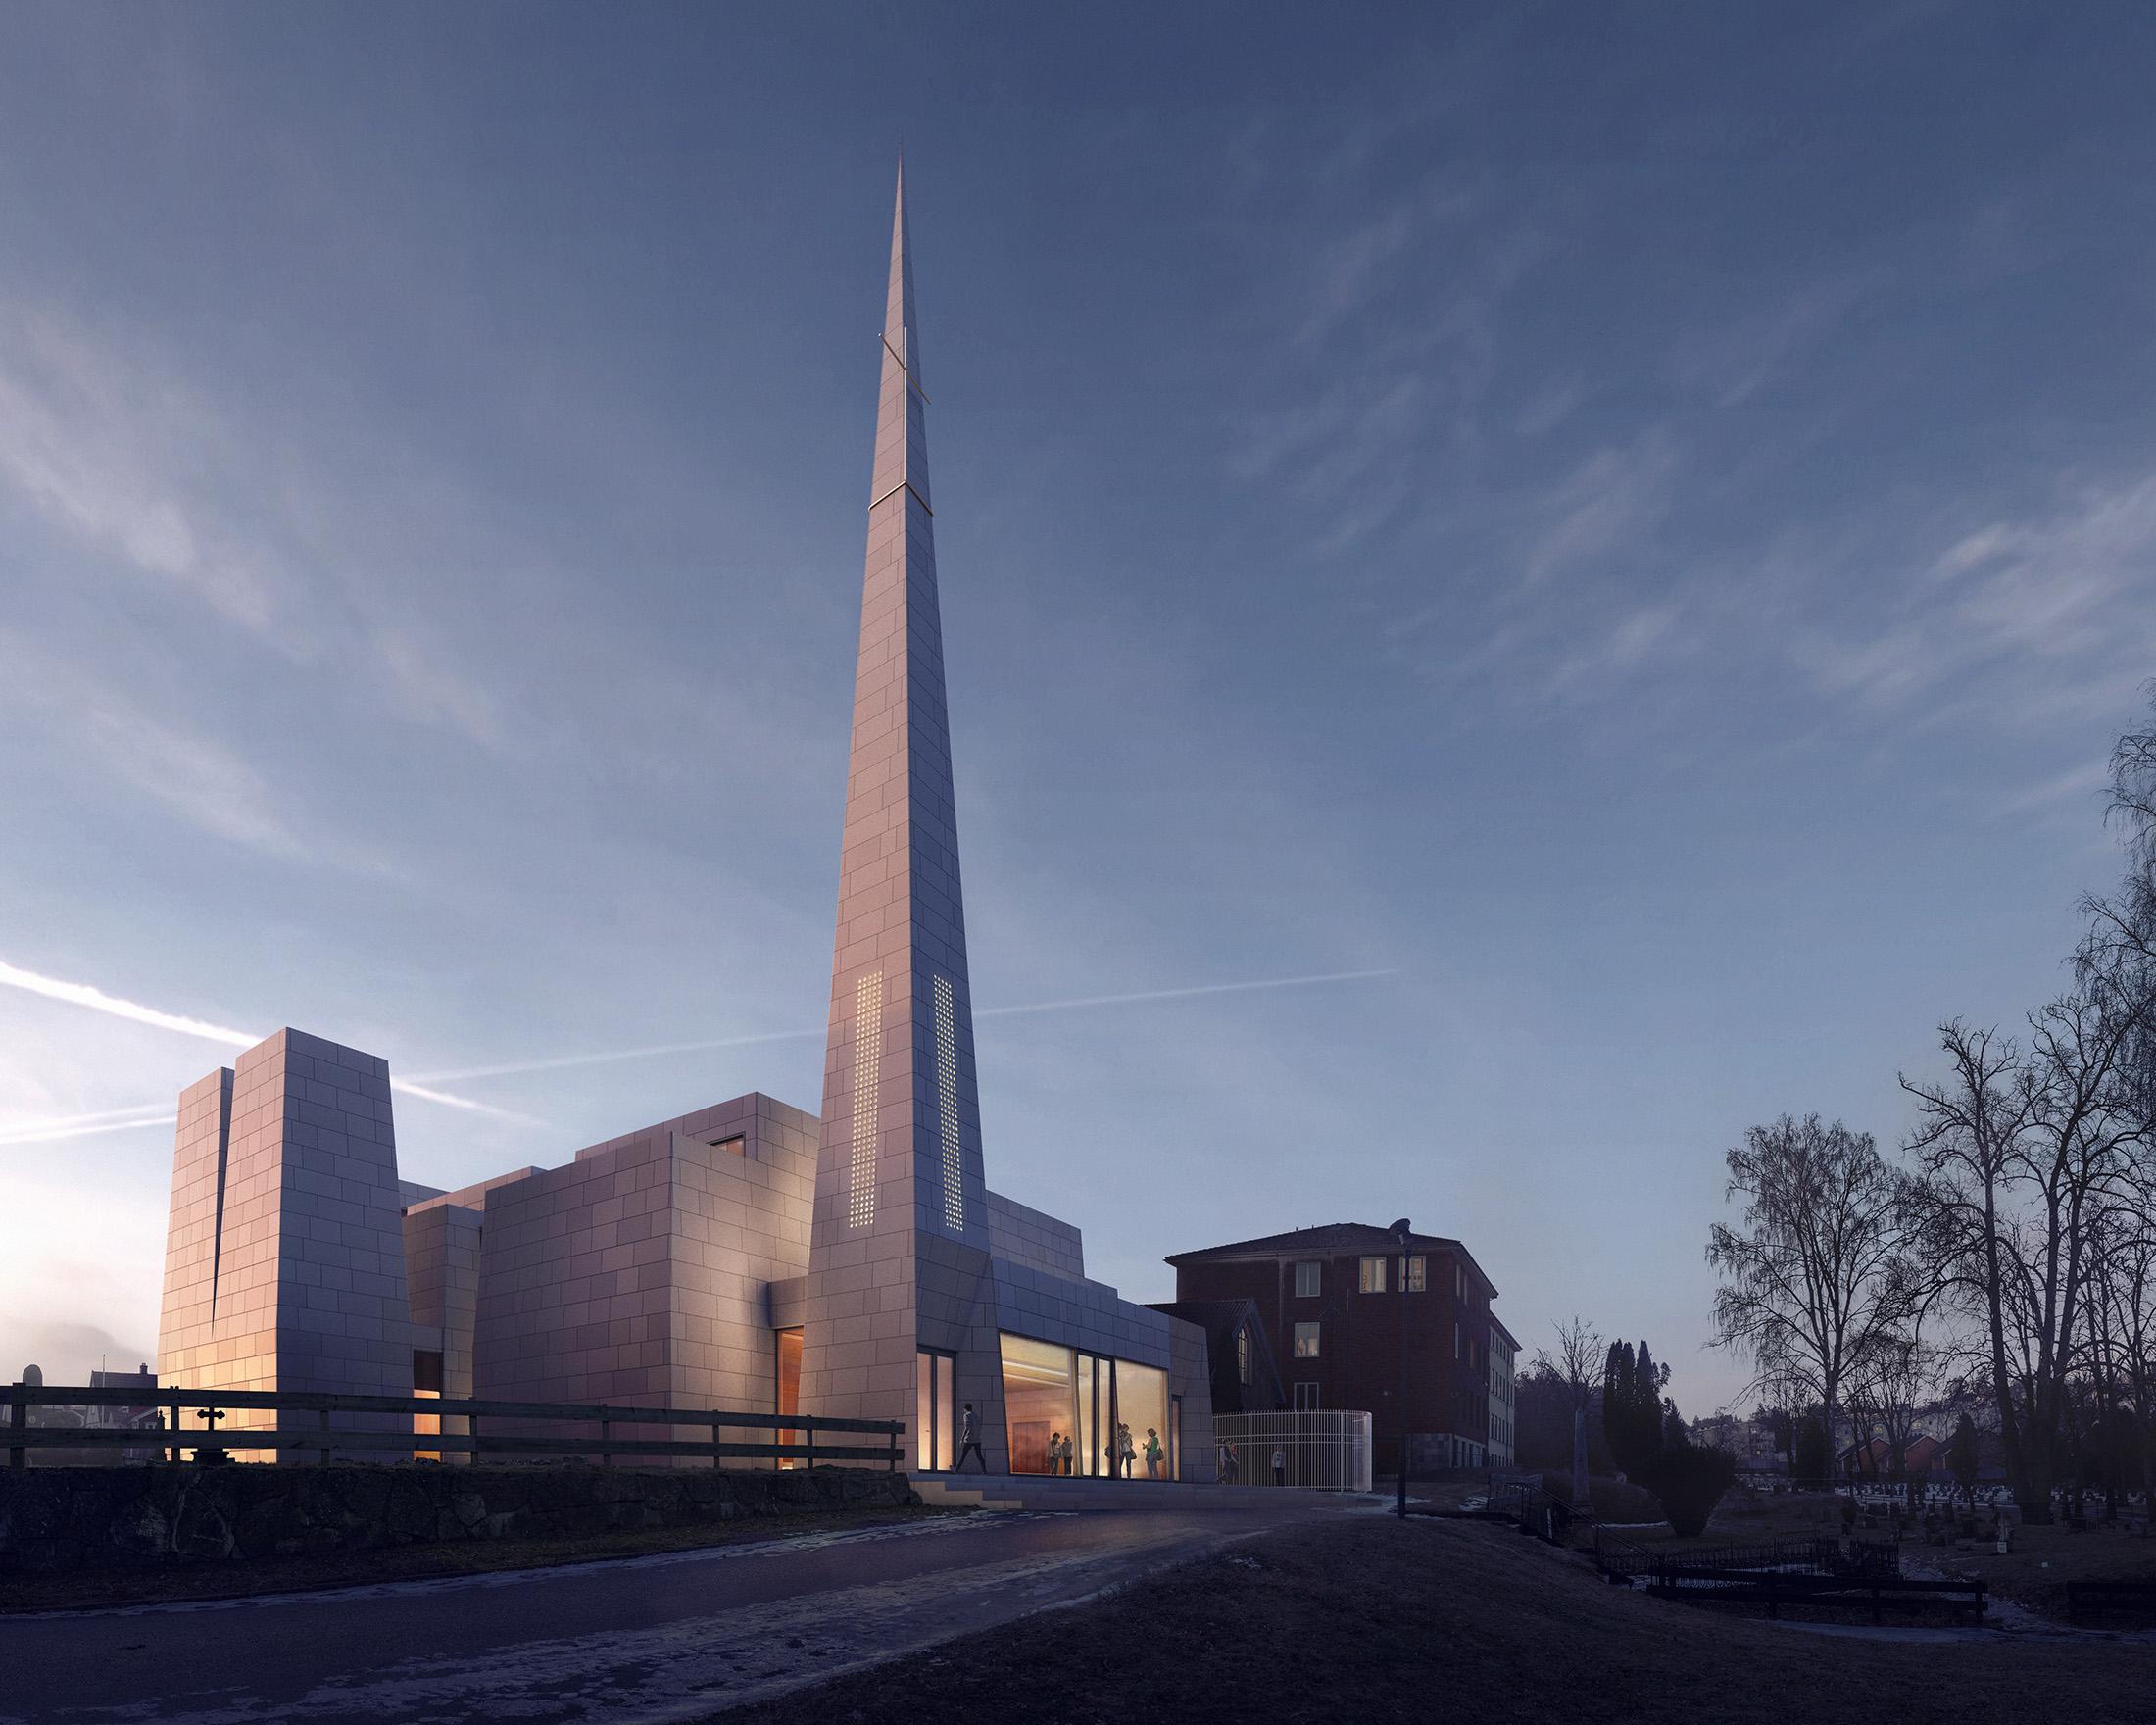 Troark & Surnevik, Porsgrunn Church, Norway, 2017